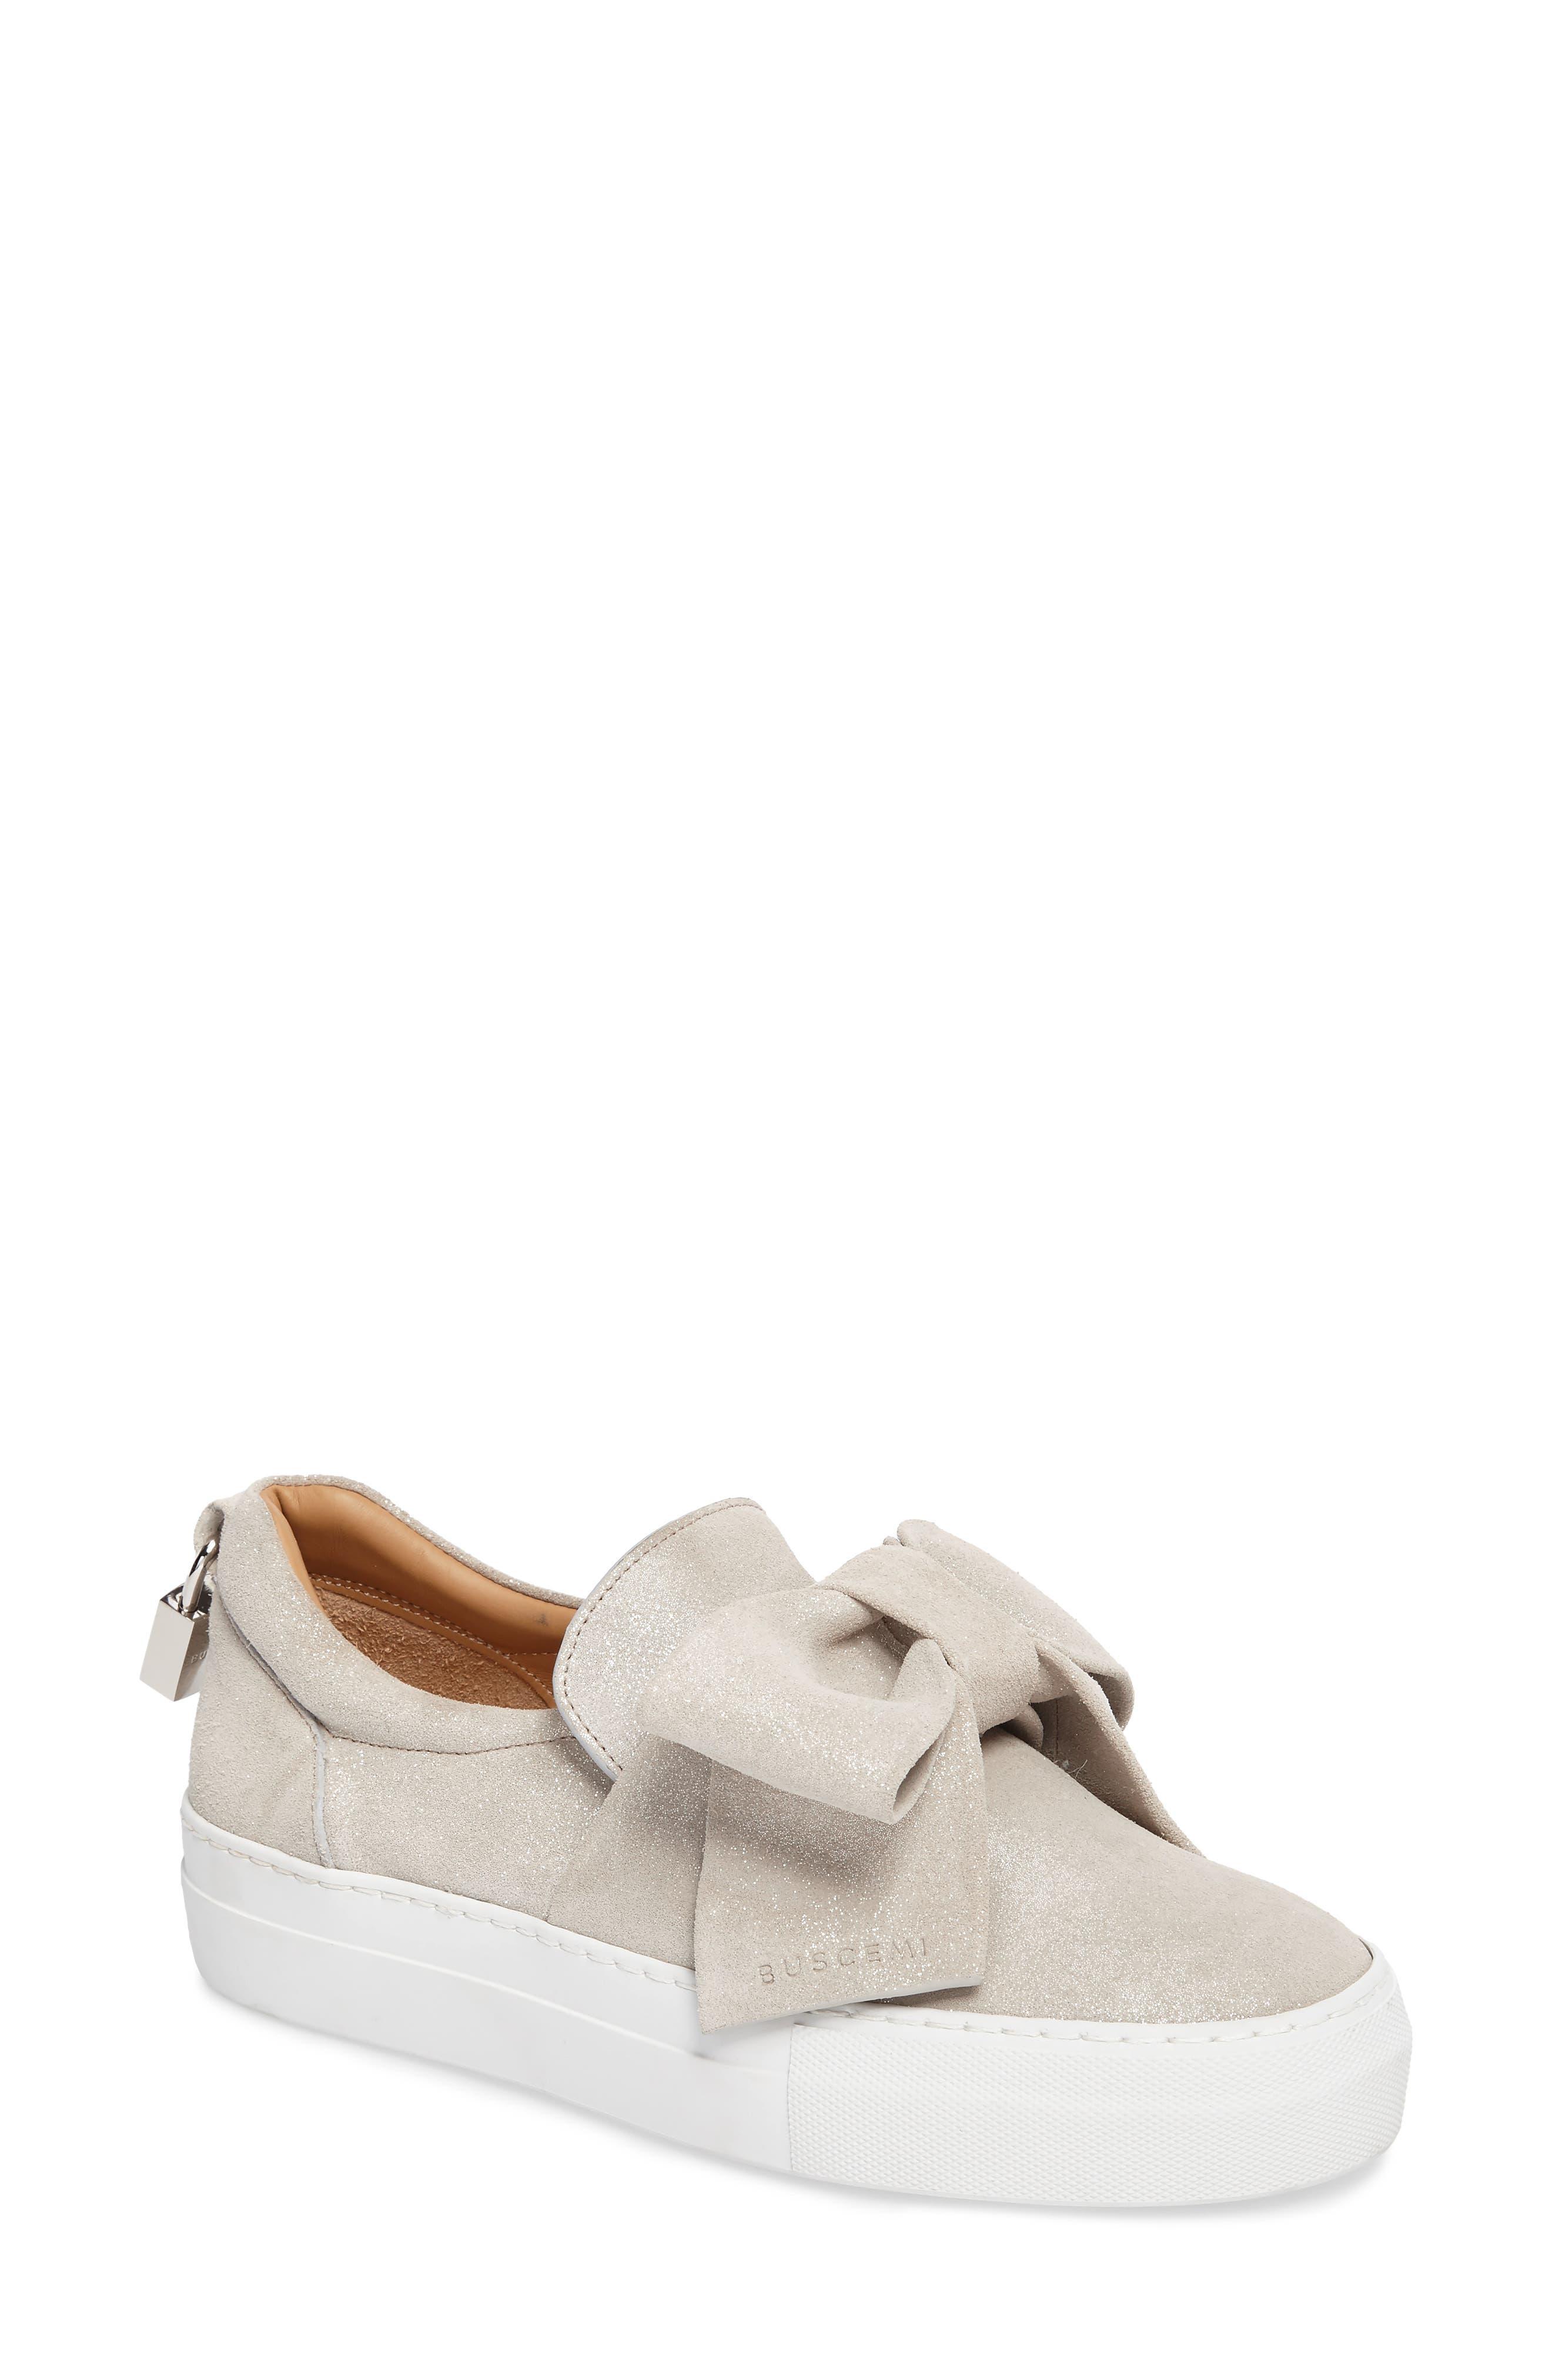 Main Image - Buscemi Bow Slip-On Sneaker (Women)